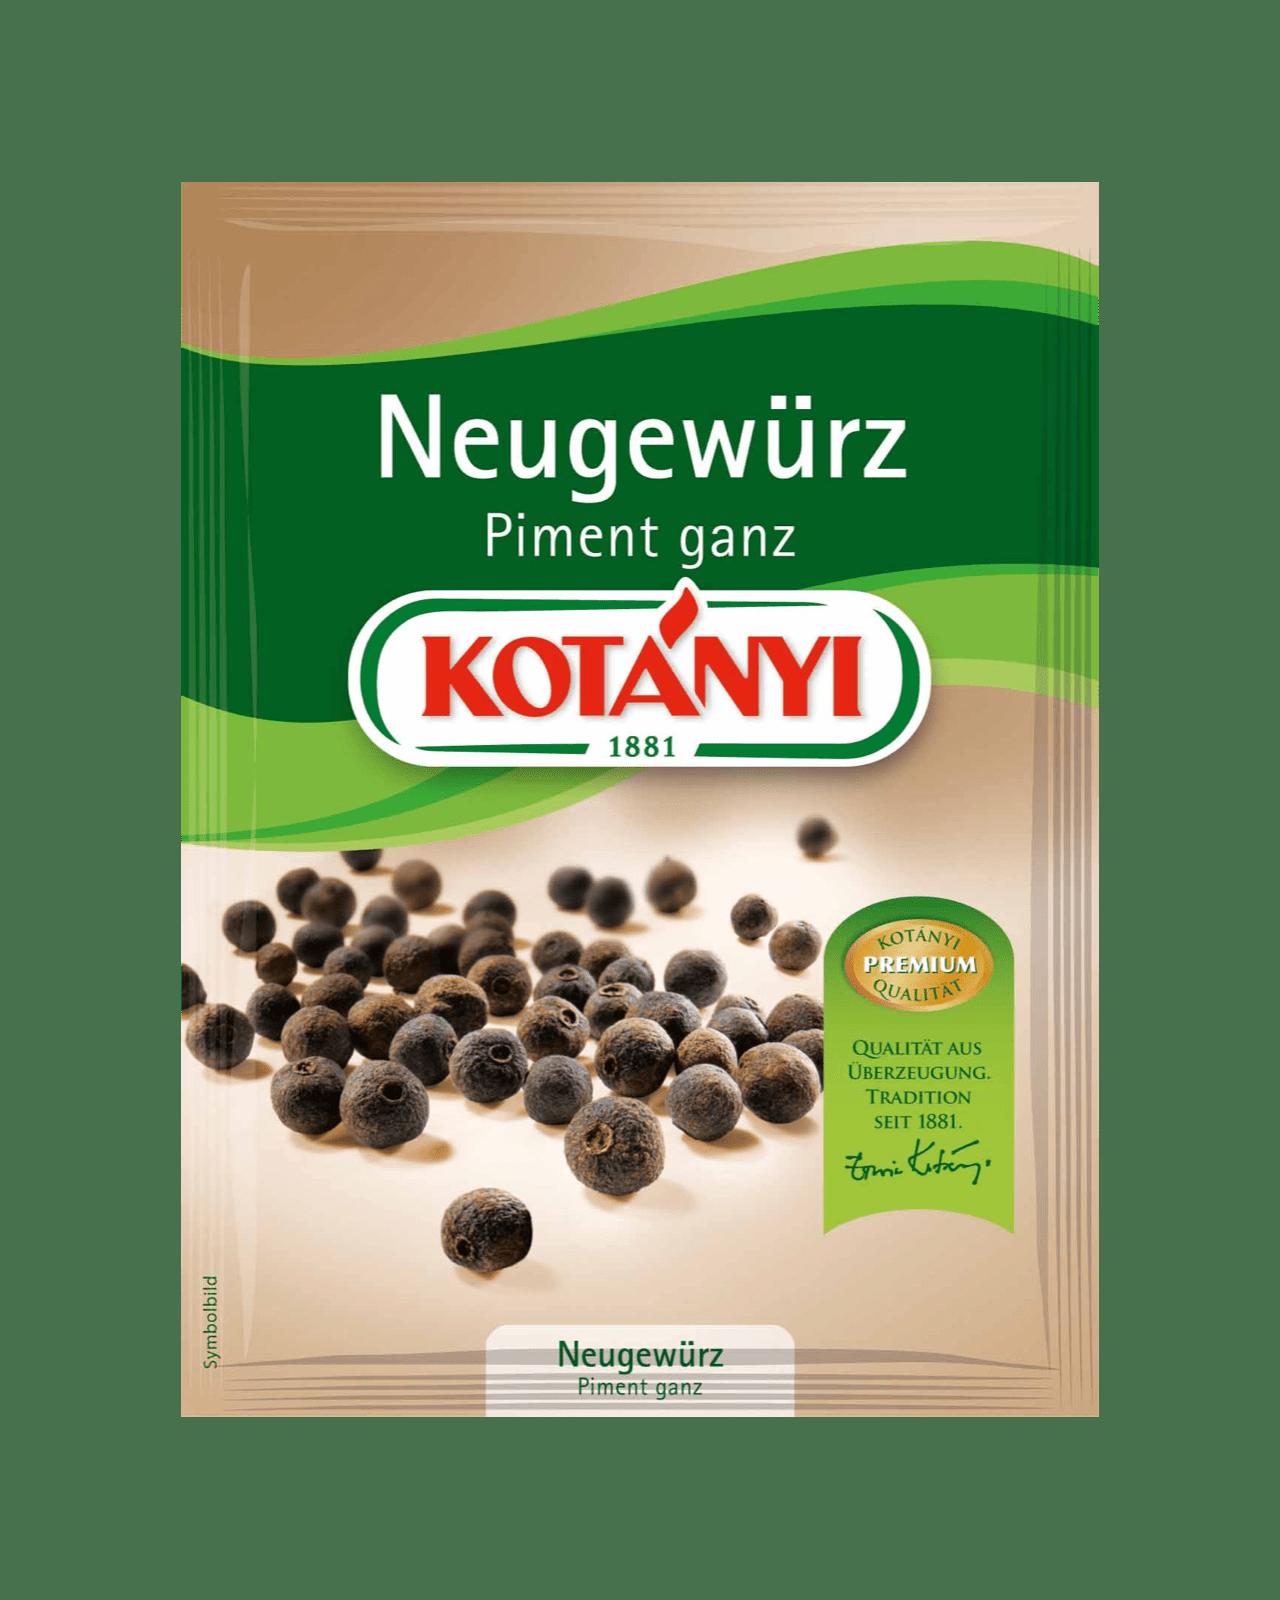 Kotányi Piment ganz im Brief